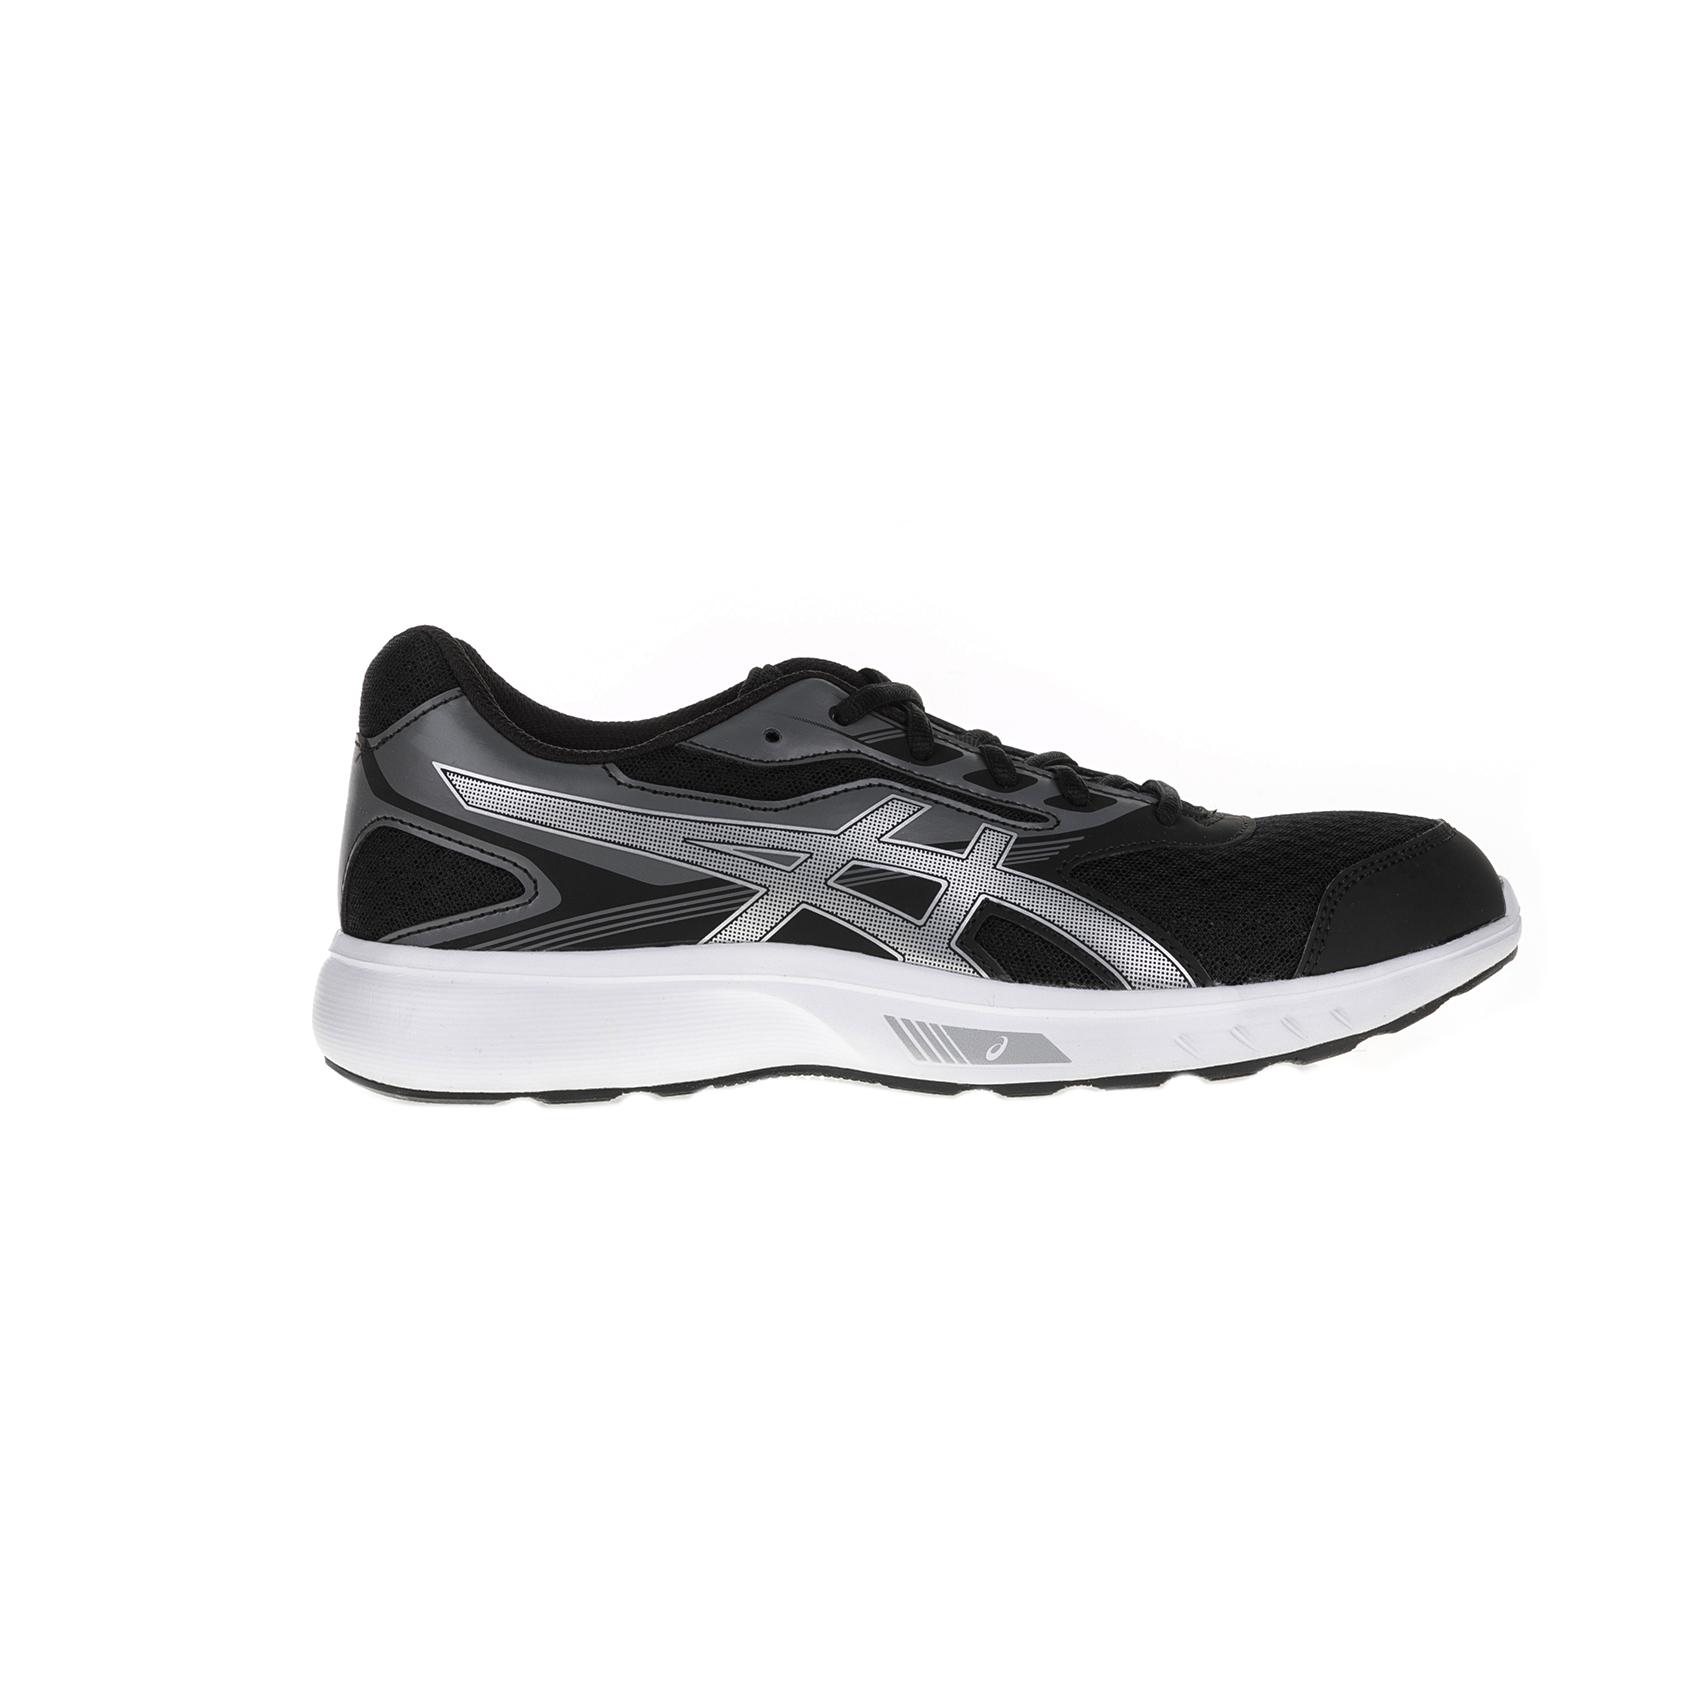 ASICS - Ανδρικά παπούτσια ASICS STORMER μαύρα ανδρικά παπούτσια αθλητικά running